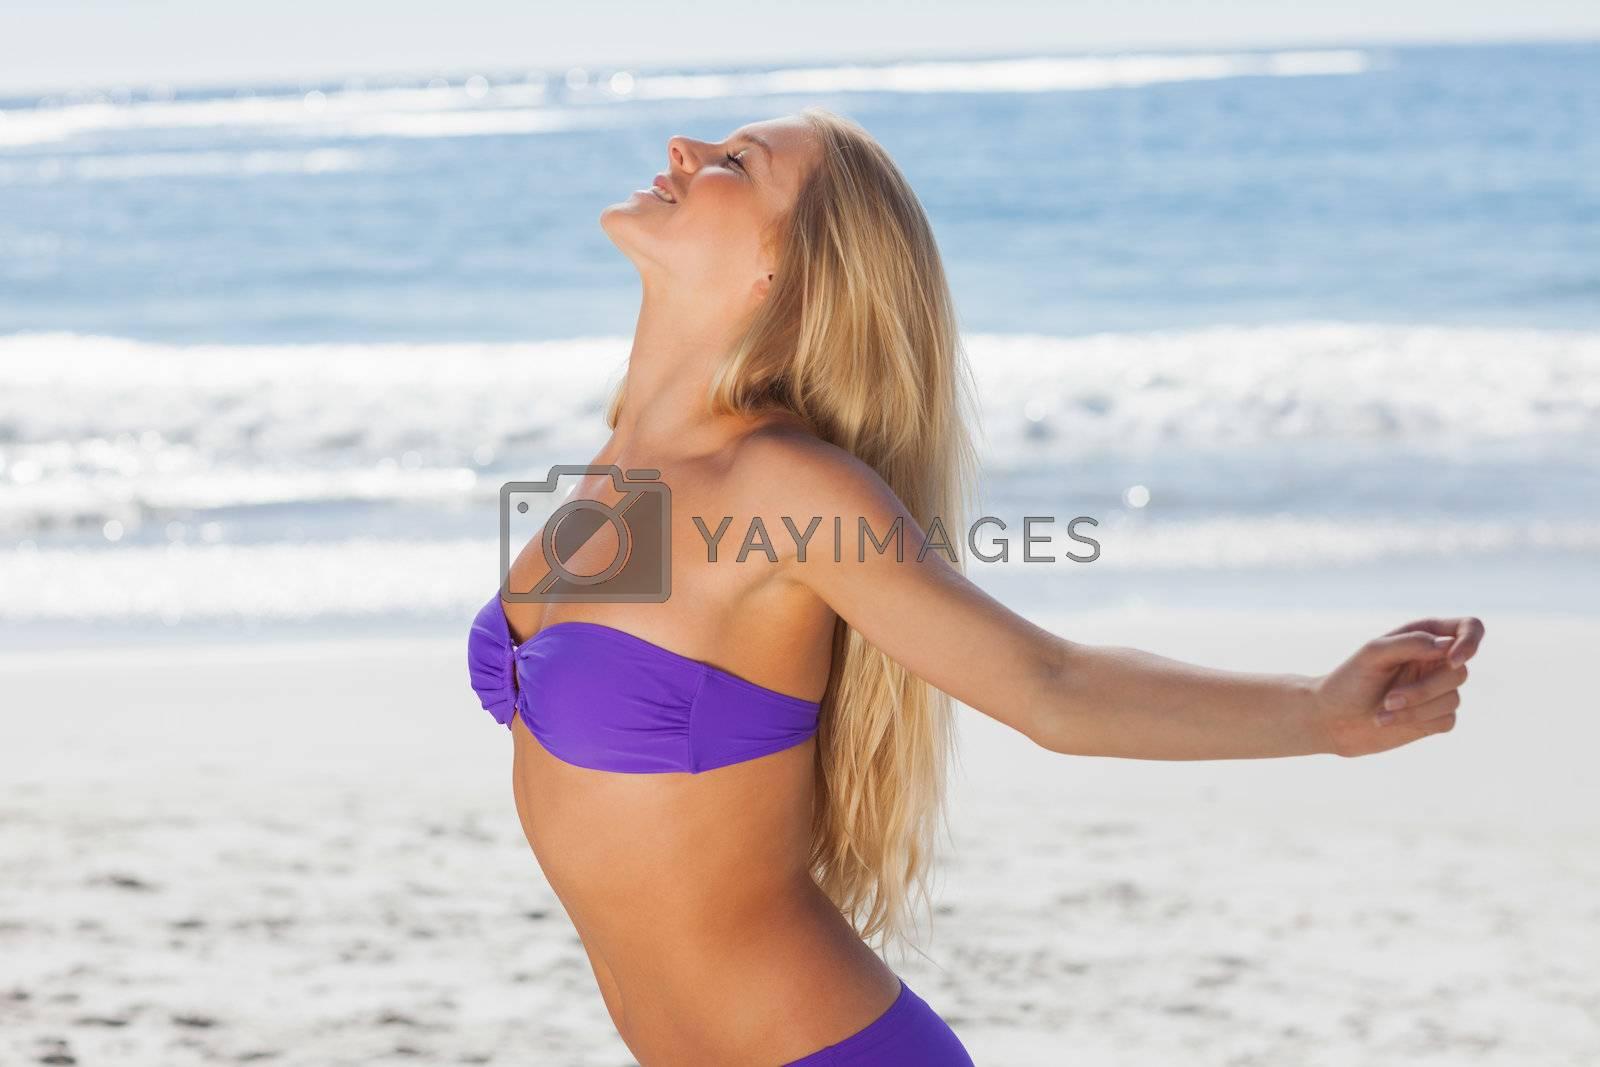 Blonde woman enjoying the sun by Wavebreakmedia